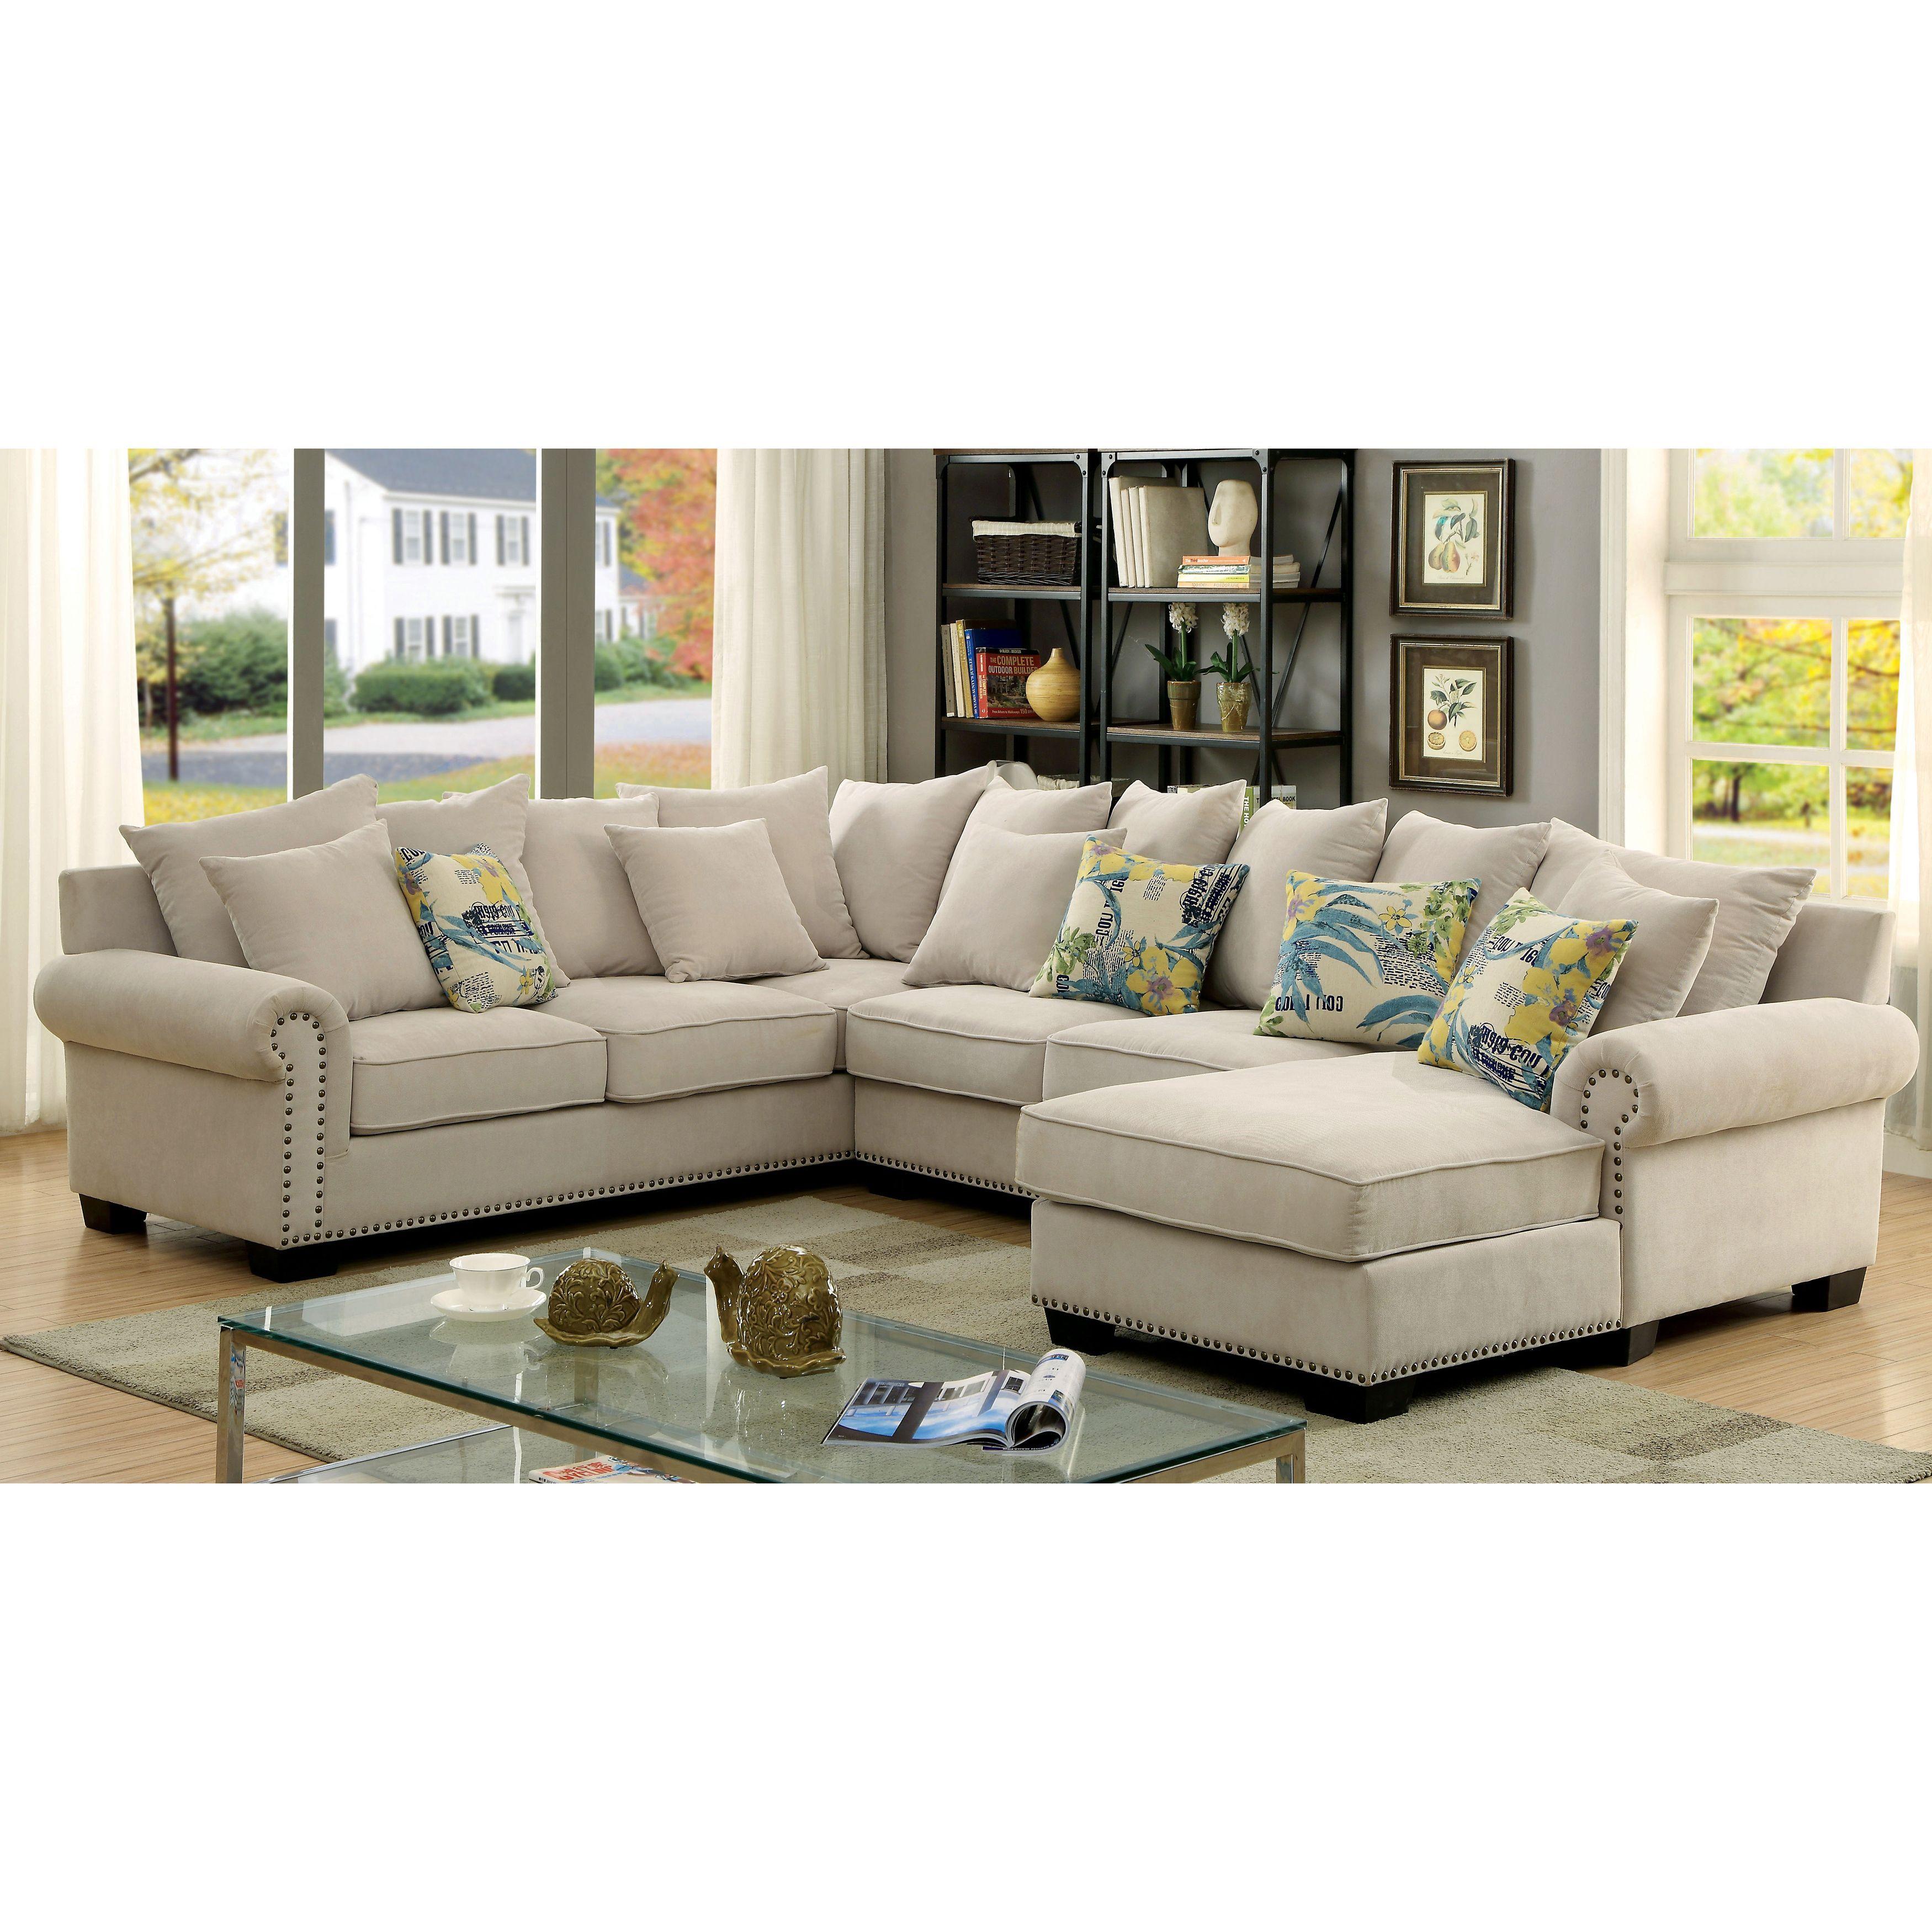 Prime Furniture Of America Casana Transitional Ivory Upholstered Ibusinesslaw Wood Chair Design Ideas Ibusinesslaworg